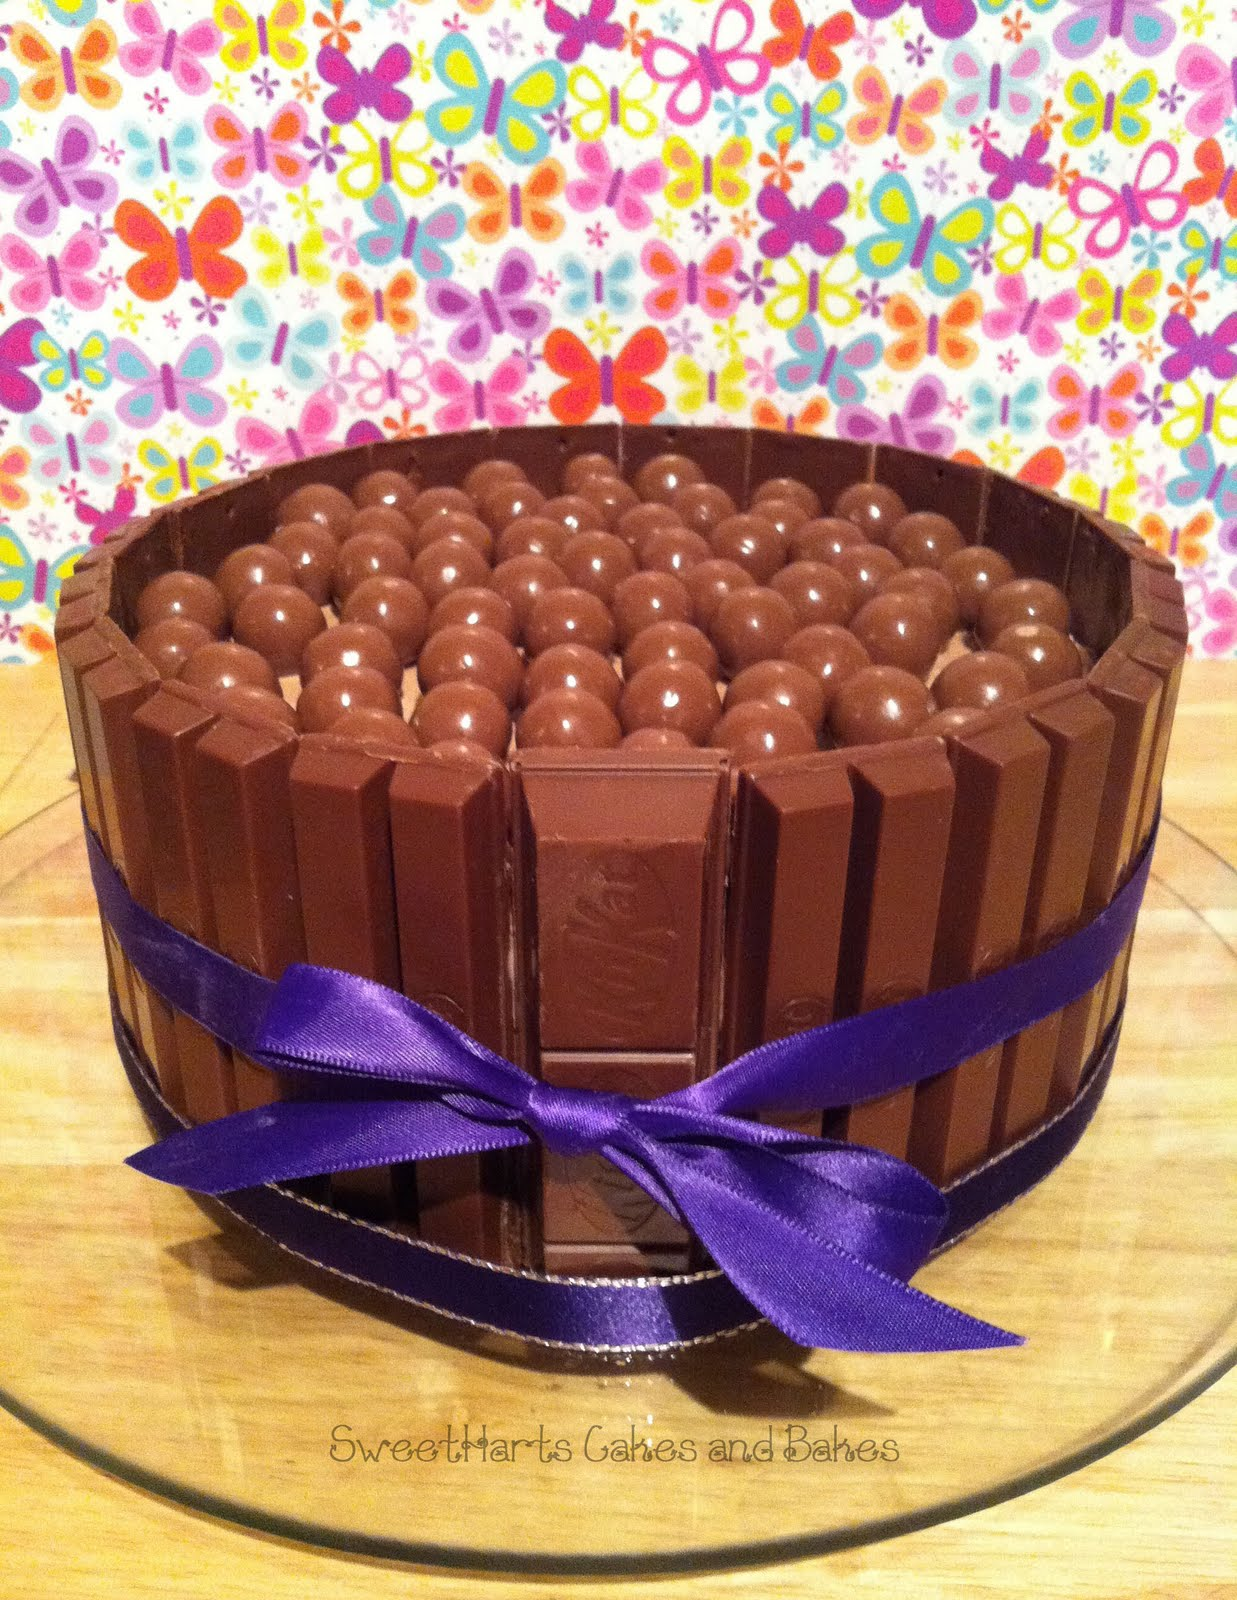 Подарки из шоколада вологда 61